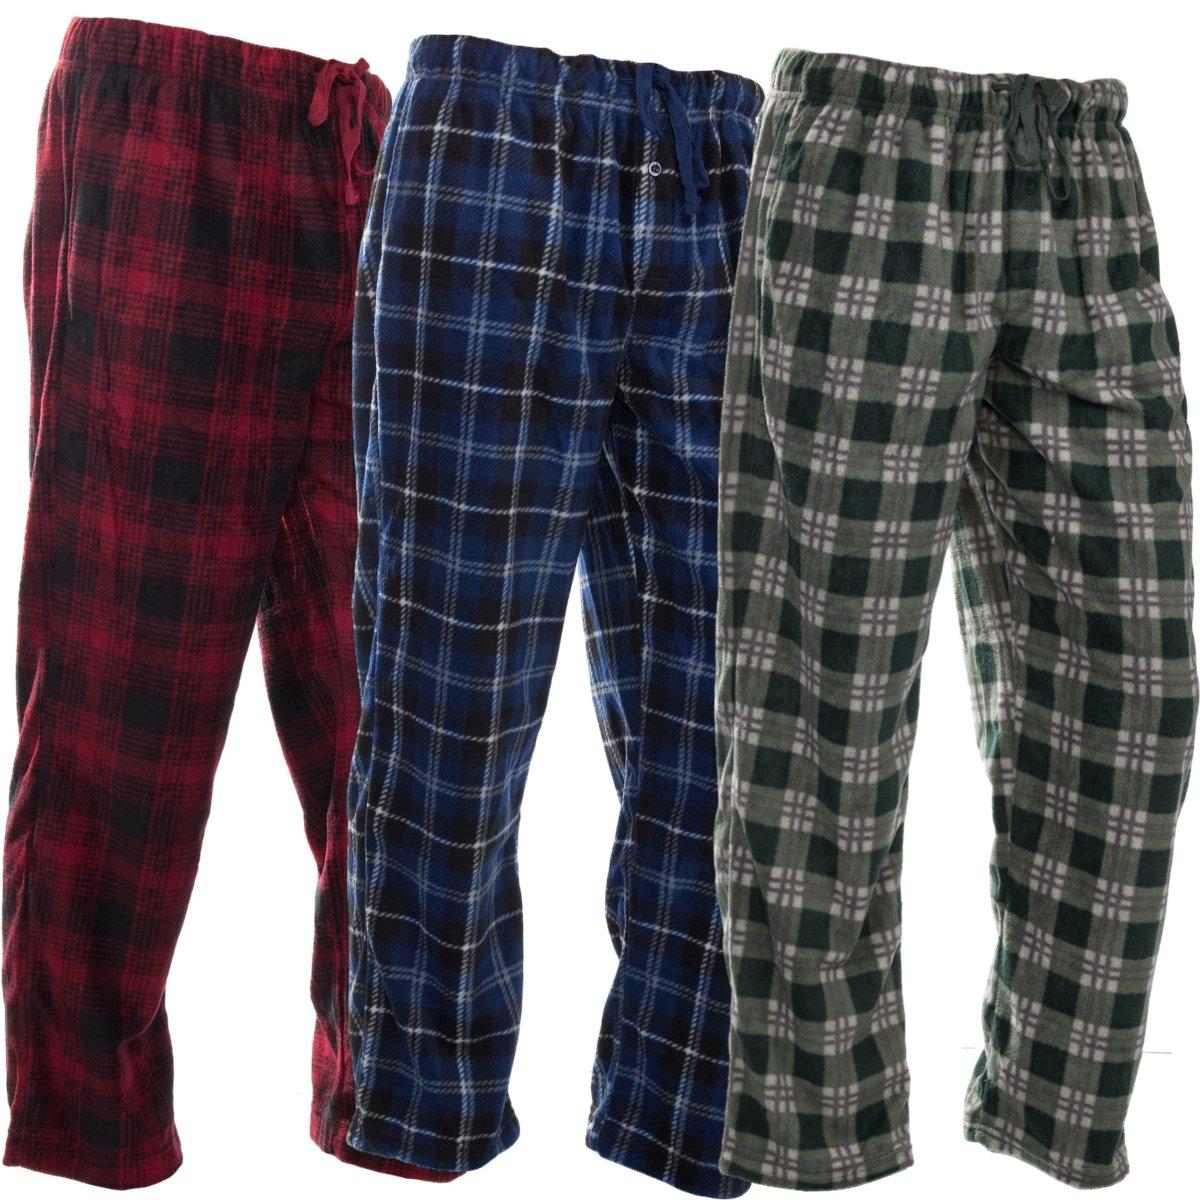 DG Hill (3 Pairs) Mens PJ Pajama Pants Bottoms Fleece Lounge Sleepwear Plaid PJs with Pockets Pants (Red, Blue & Green), Multicolor, Large: 33-35'' waist